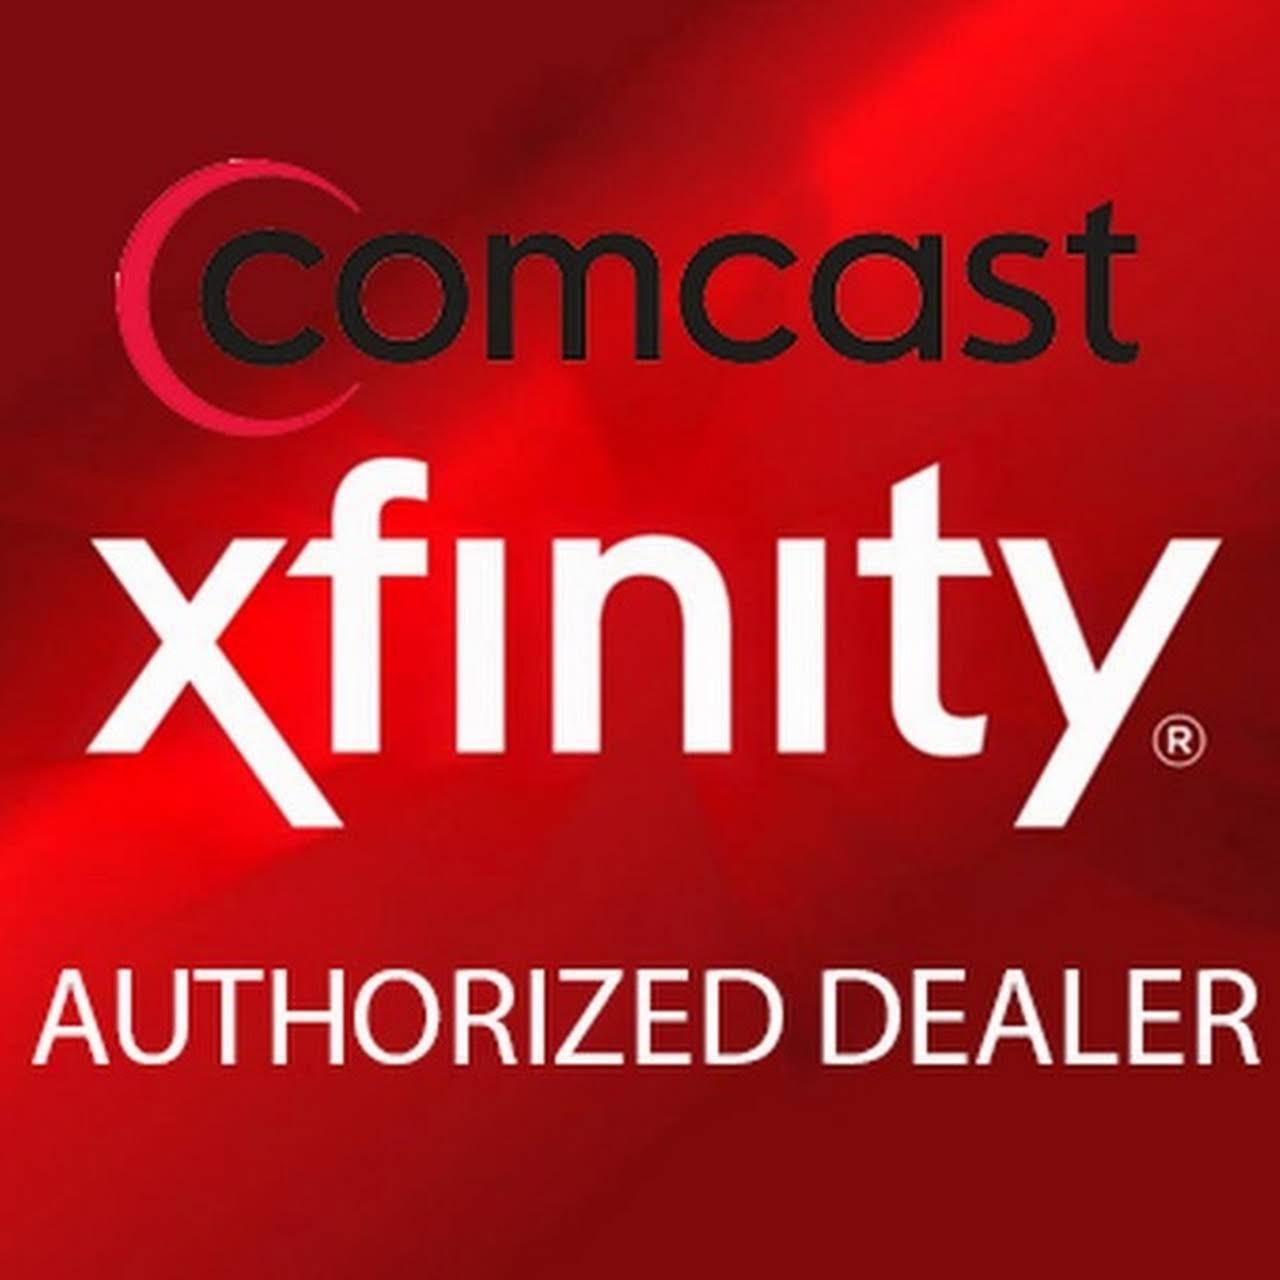 Comcast Xfinity Authorized Retailer - Internet Service